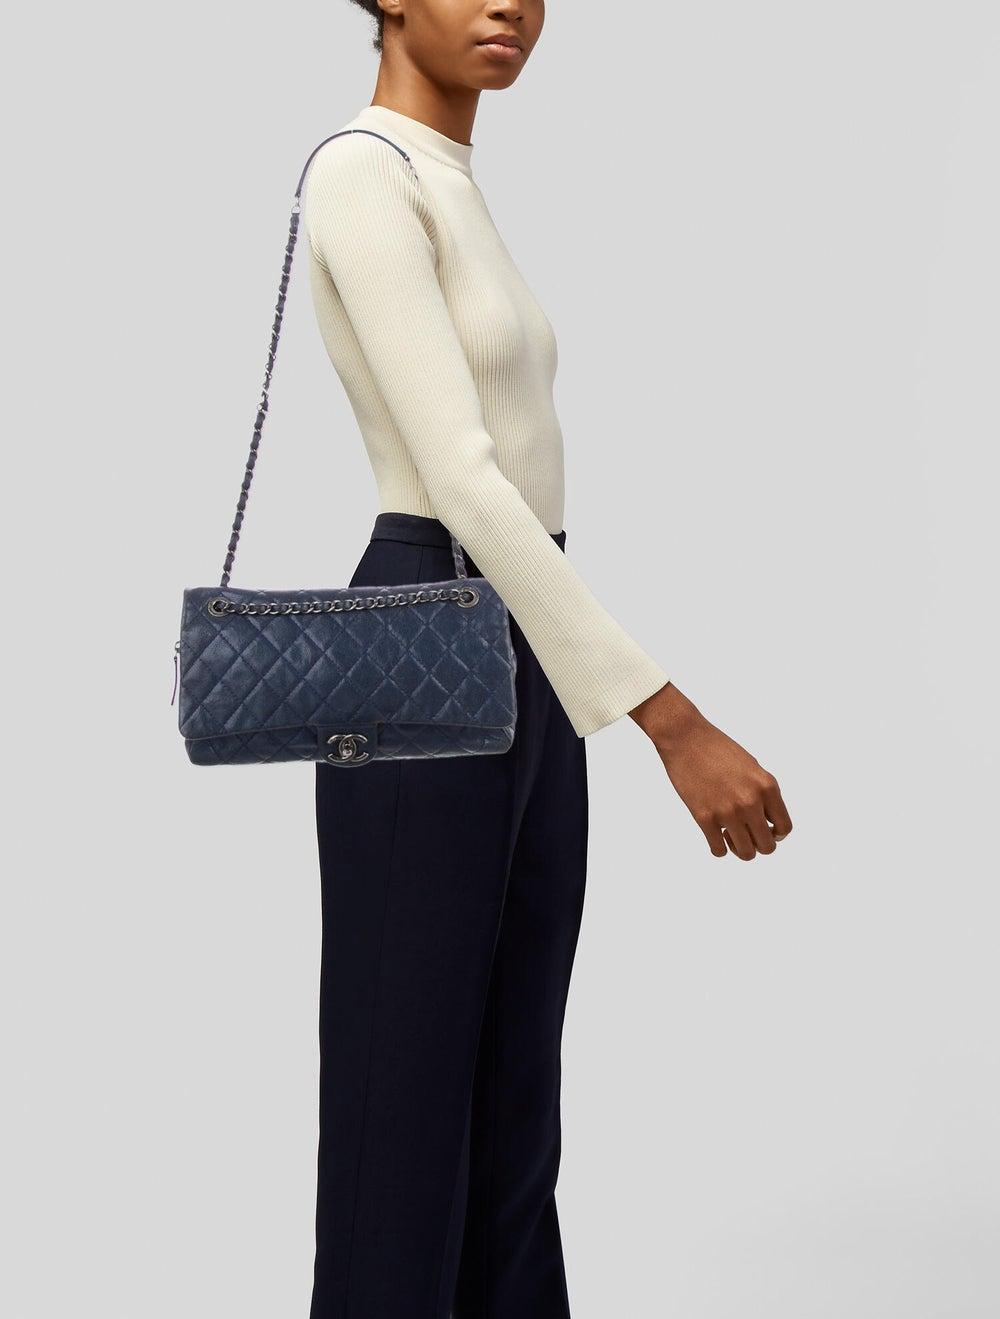 Chanel Jumbo Easy Caviar Flap Bag Blue - image 2